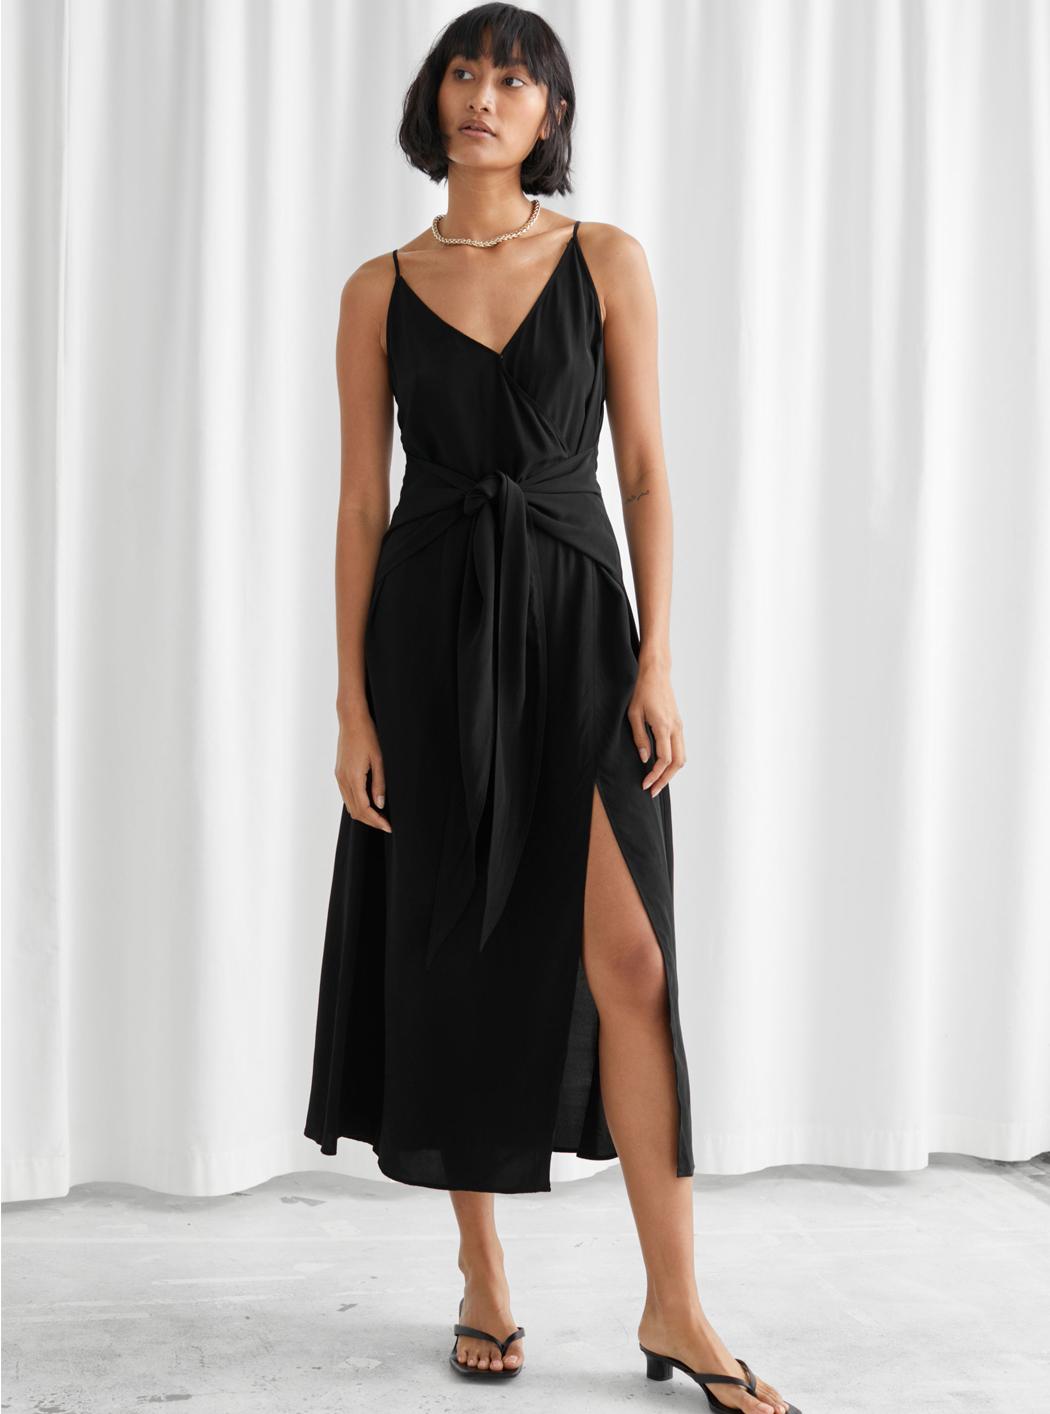 opeb side black dress